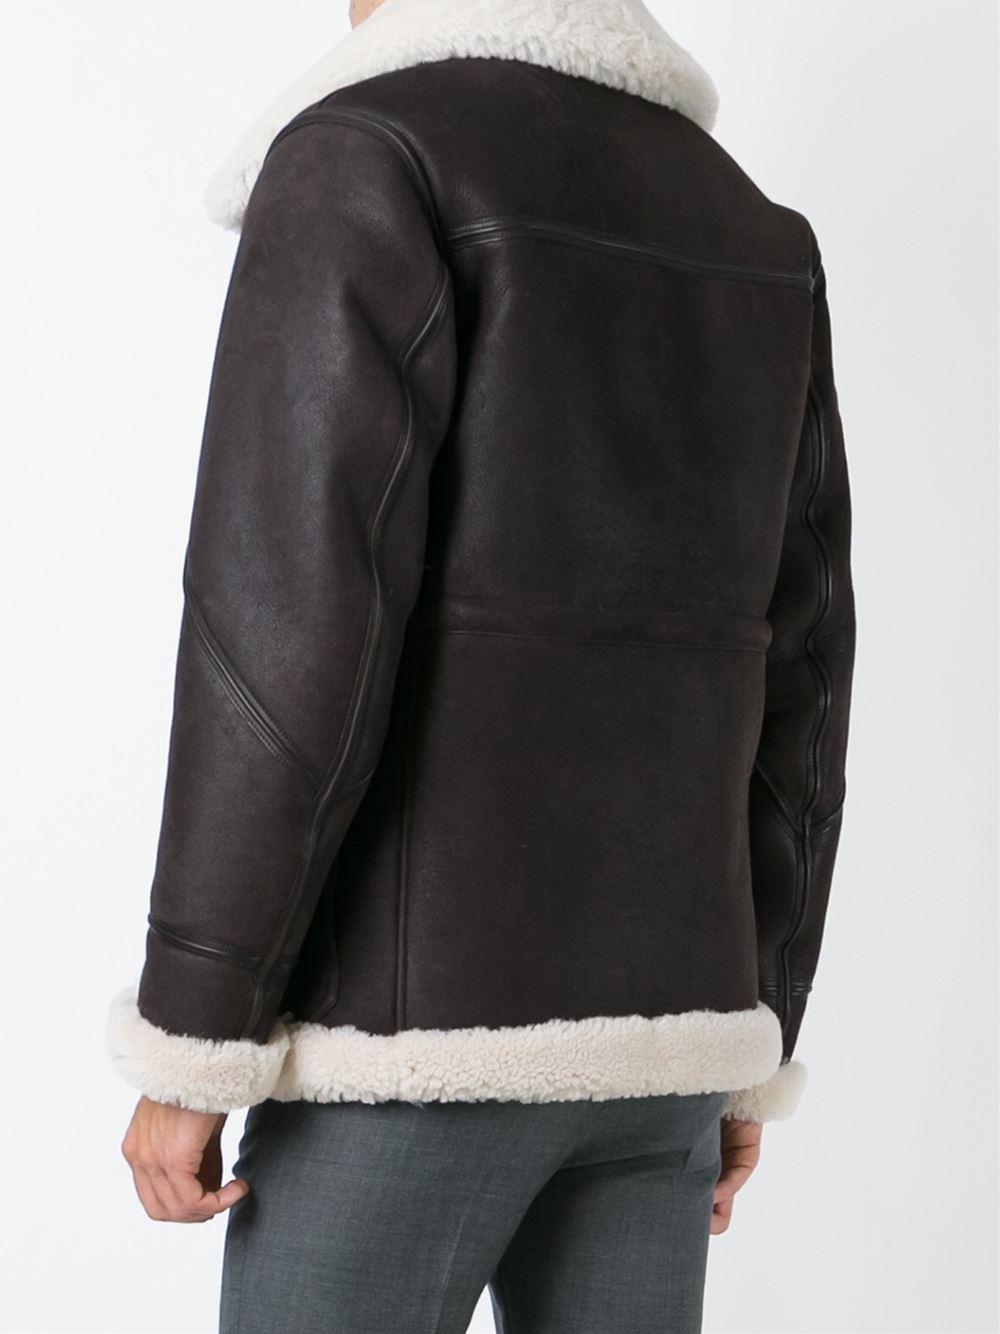 Burberry Brit Shearling Aviator Jacket in Black for Men